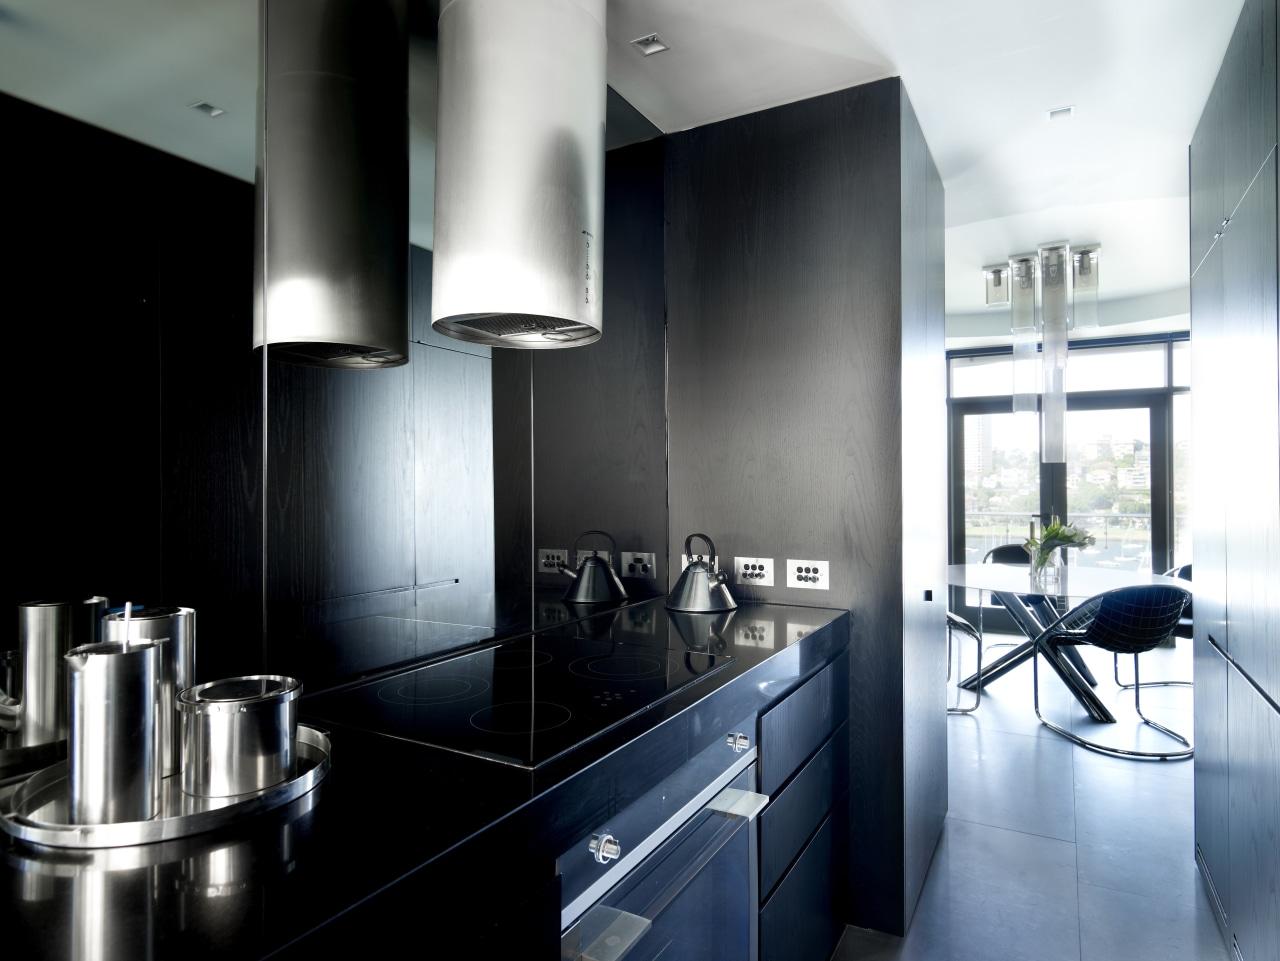 It's the appliances that enliven Greg Natale's galley architecture, countertop, interior design, kitchen, product design, black, white